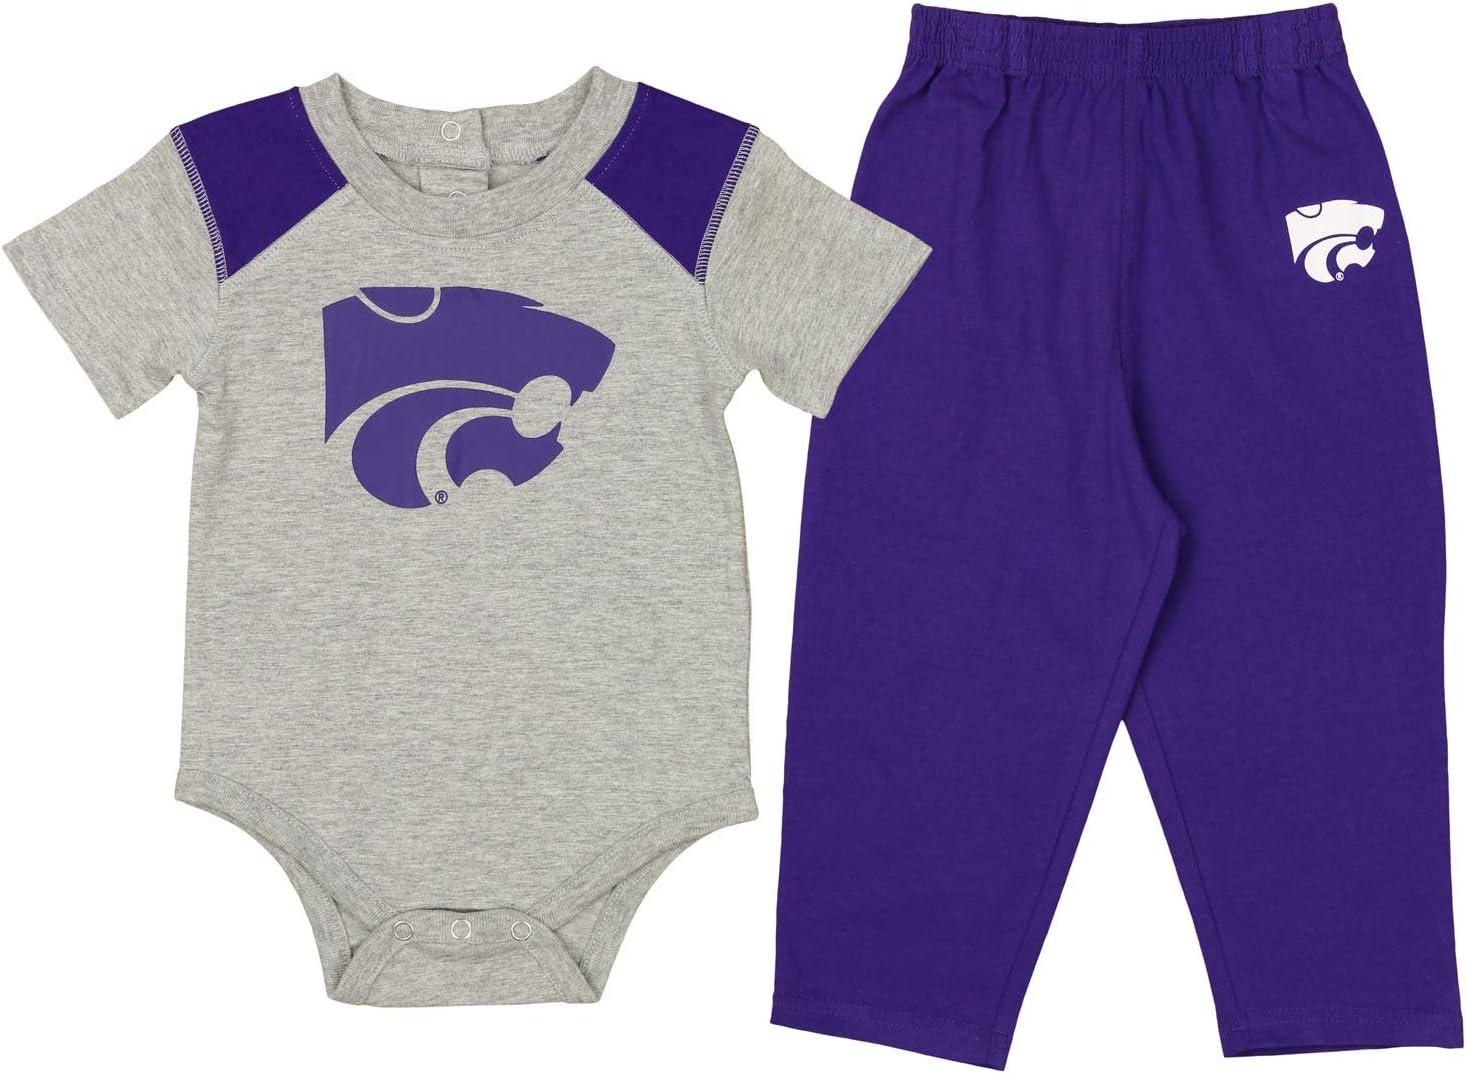 OuterStuff NCAA Infant Ellipse Creeper /& Pant Set Team Variation 12M-24M